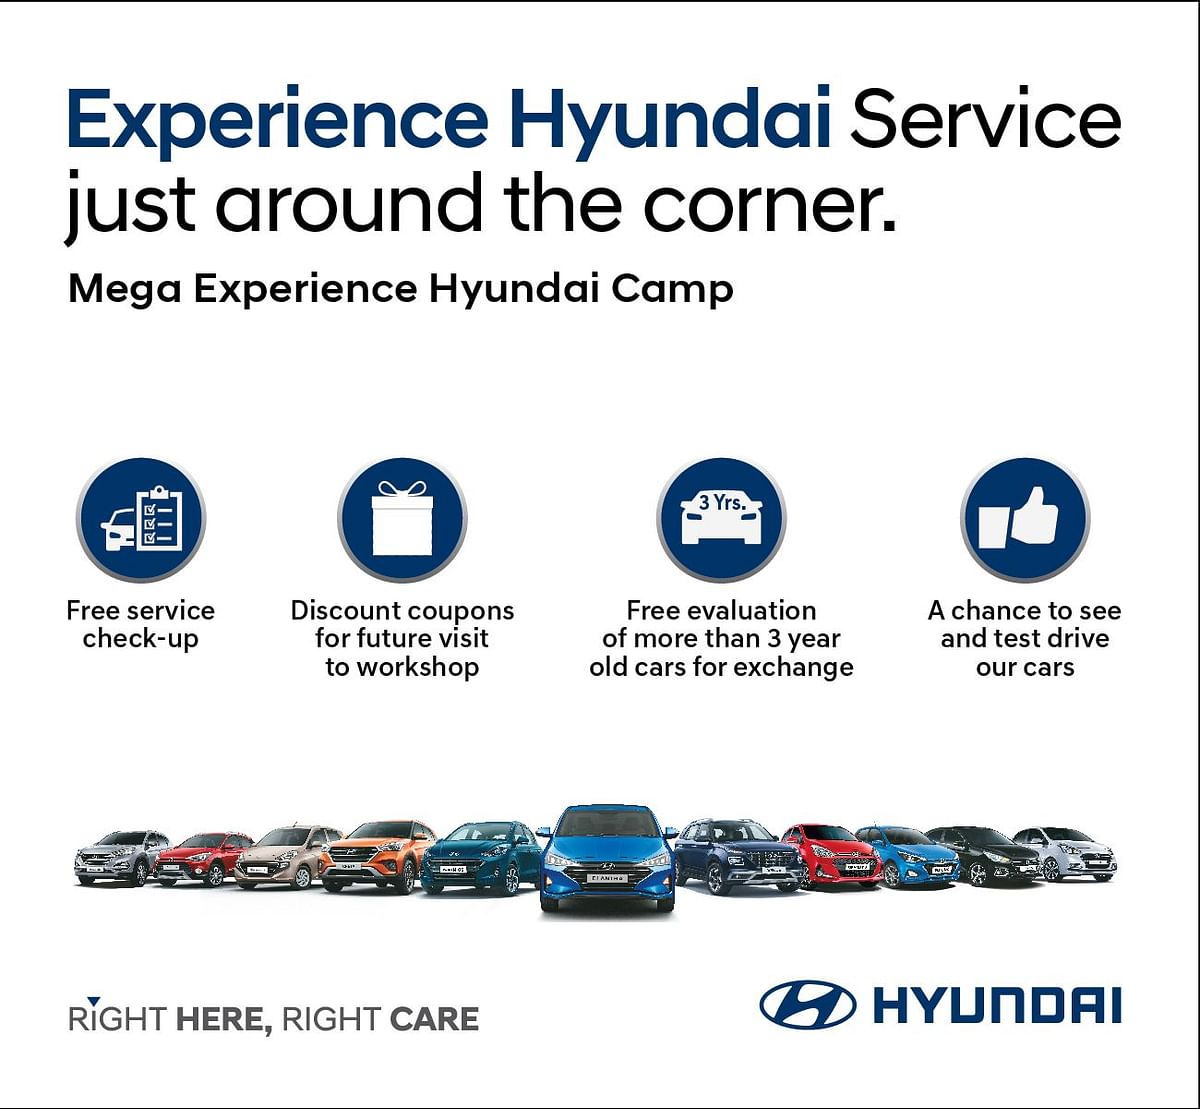 Hyundai Motor India organizes a 'Experience Hyundai' Camp